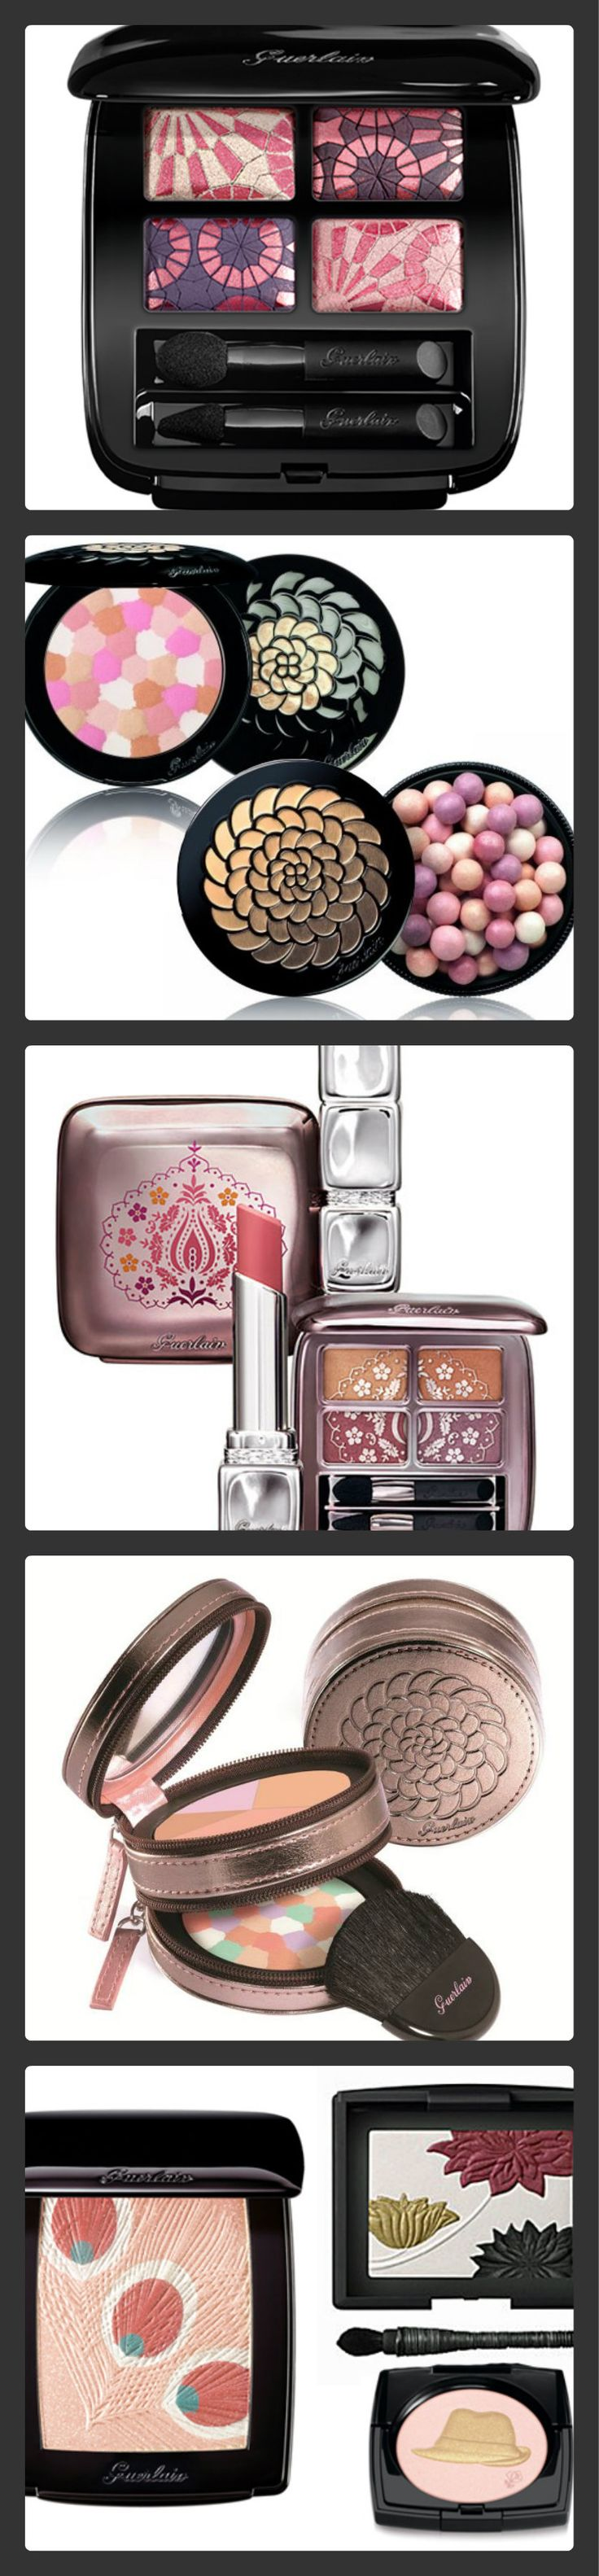 GUERLAIN MakeUp Collection ✨․լ̰́ӭ̣̍T̺͆'§͈̊․‷ᗰ̲̗a⃞Ƙ̏ɝ͎ ੫̼̊ᖘ̇‴․✨